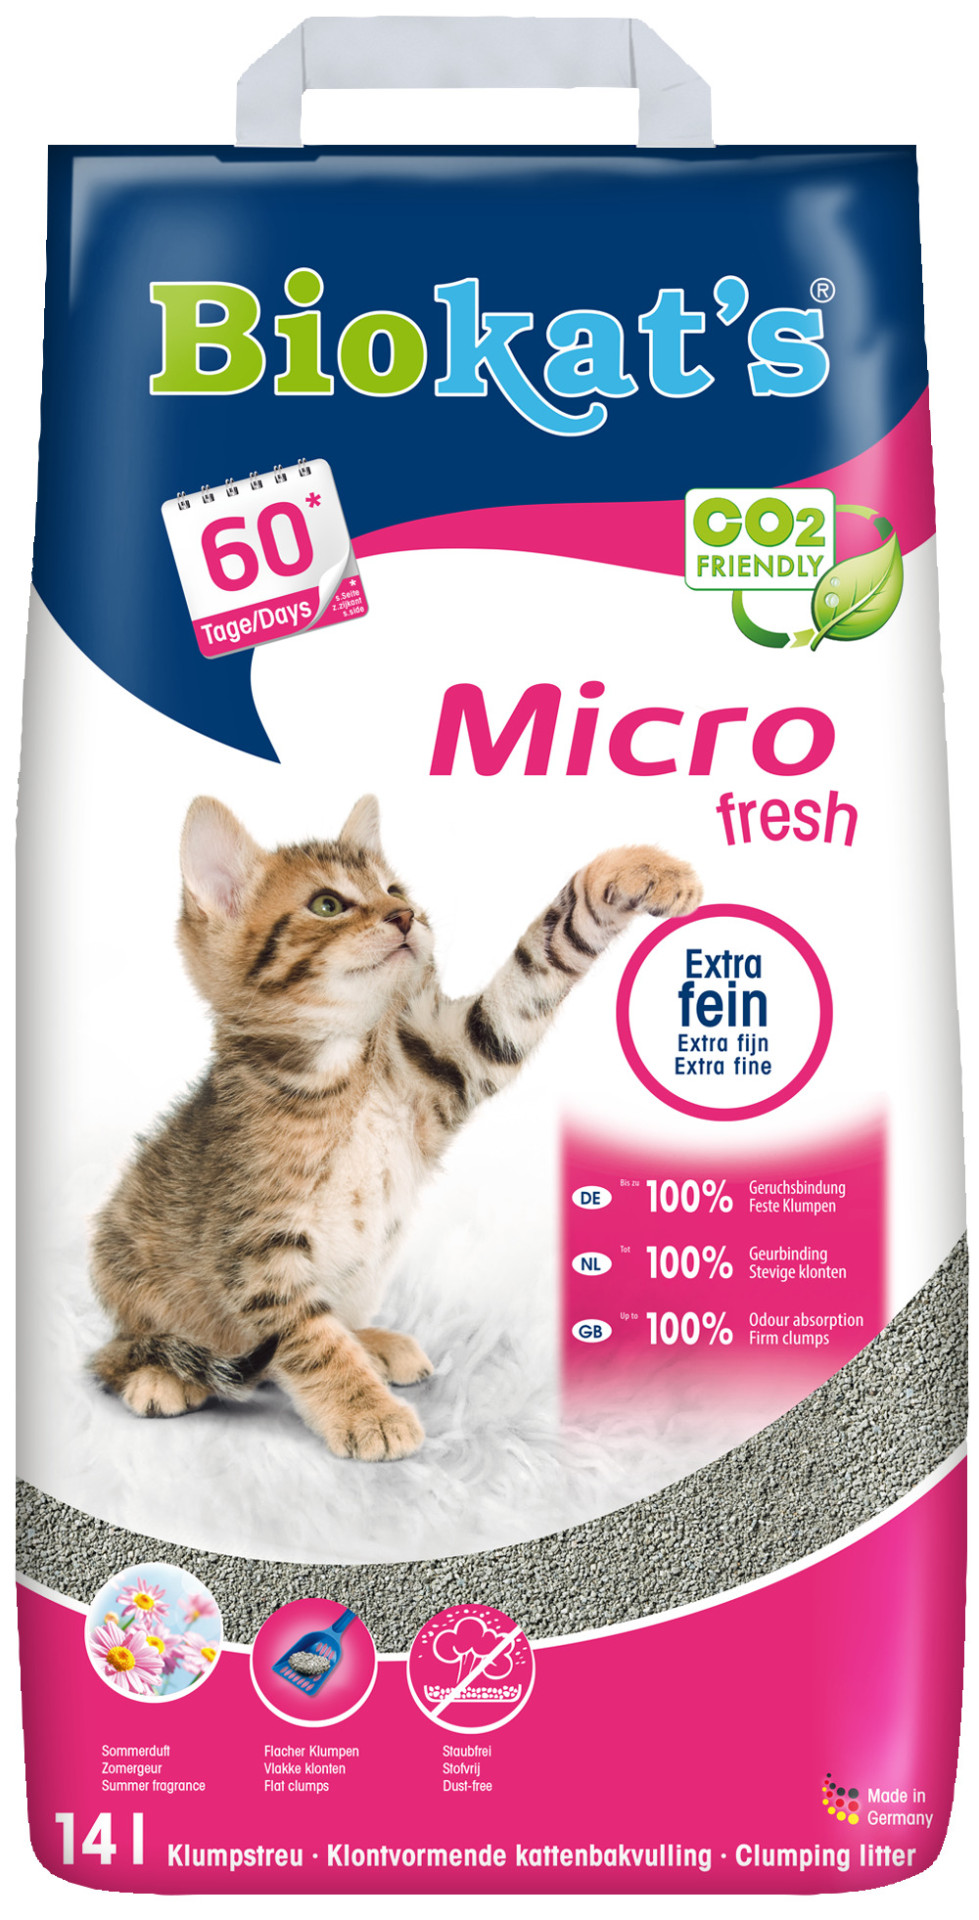 Biokat's Micro Fresh <br>14 ltr